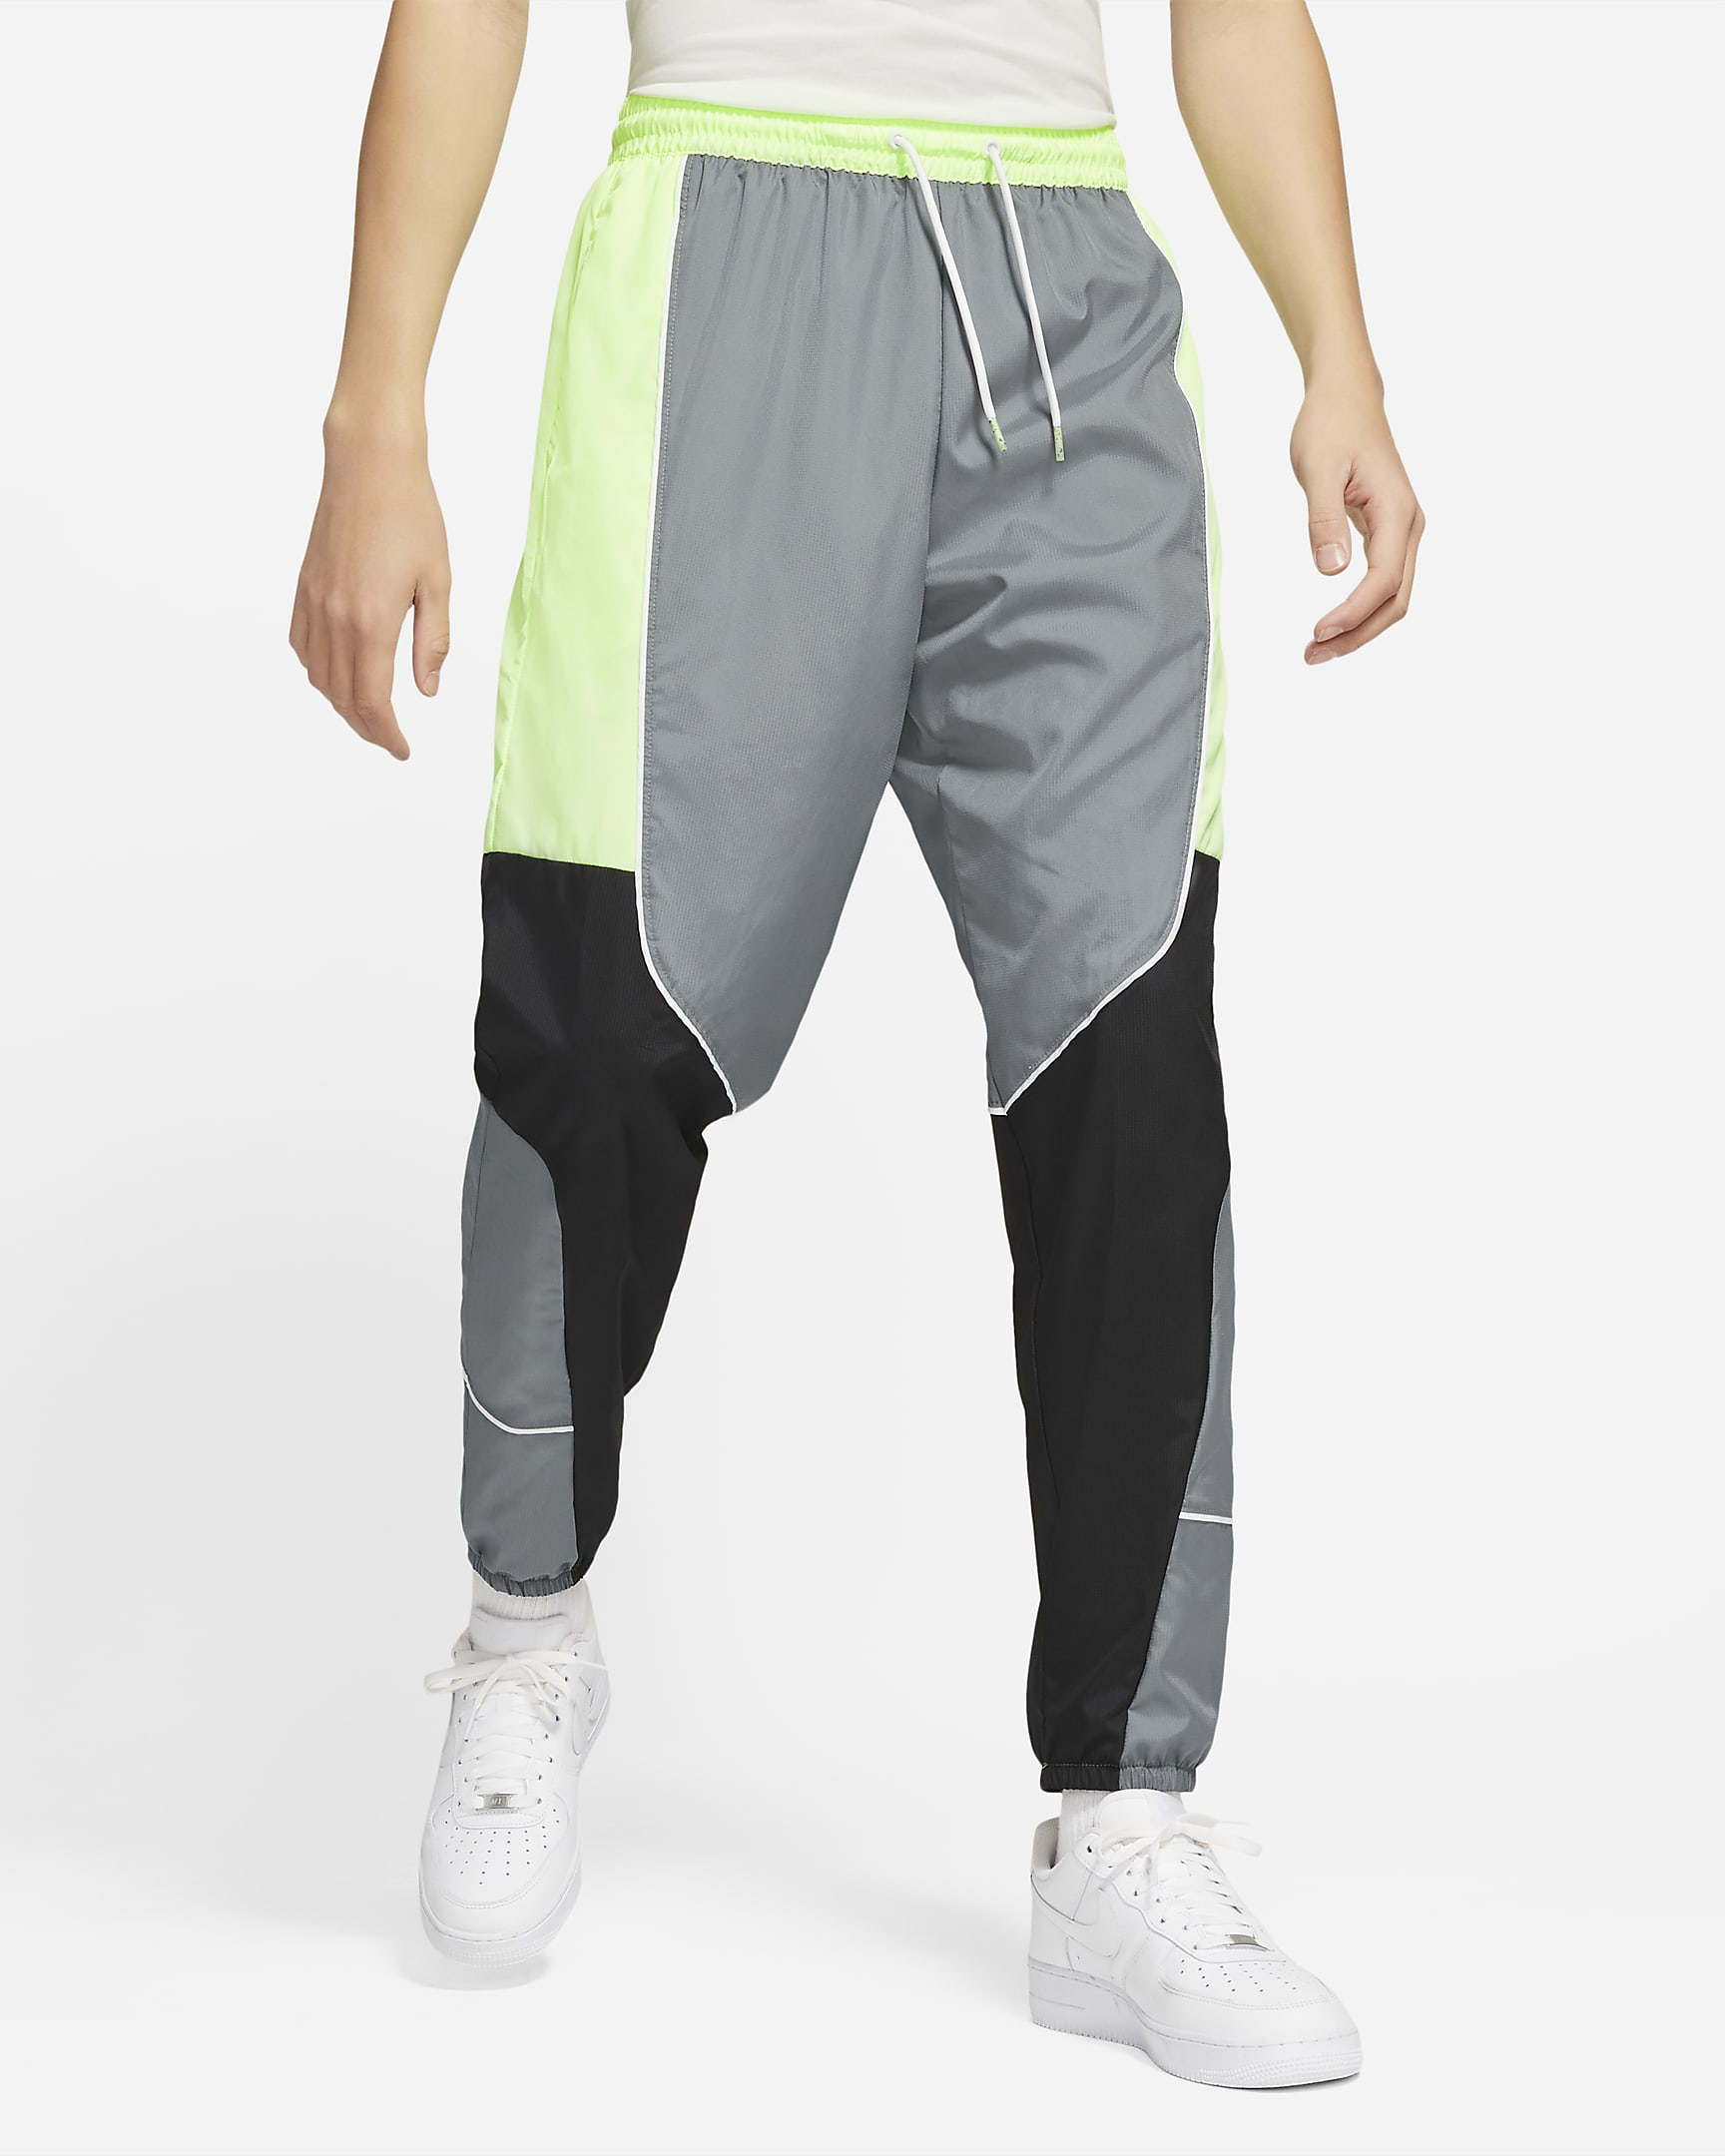 throwback-mens-basketball-pants-3cmwhW